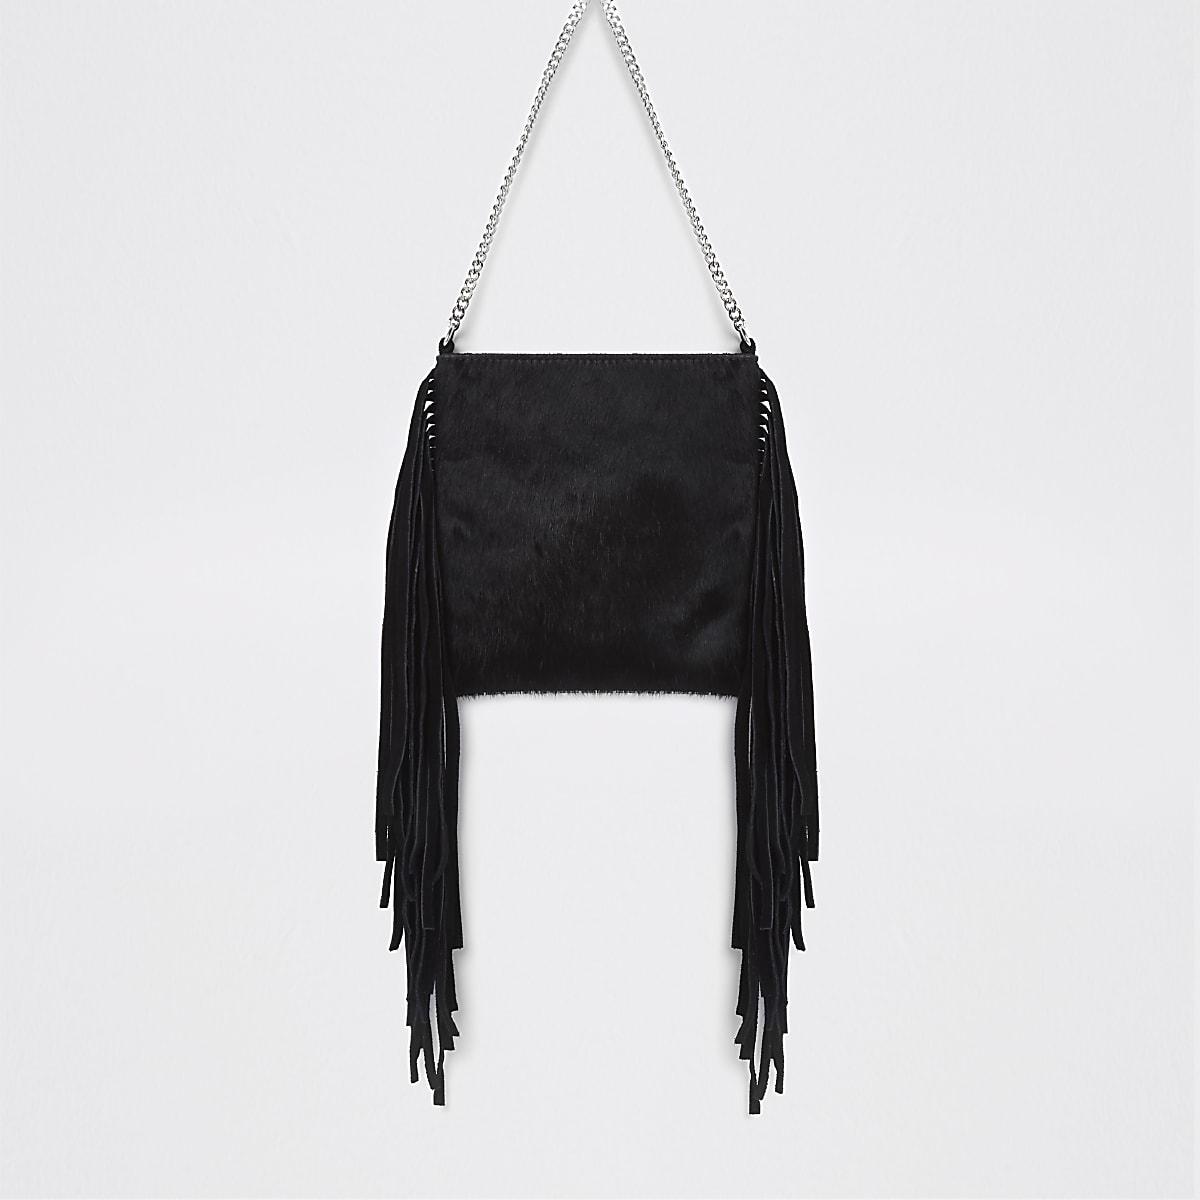 1b756a43e Black leather tassel mini cross body bag - Cross Body Bags - Bags ...